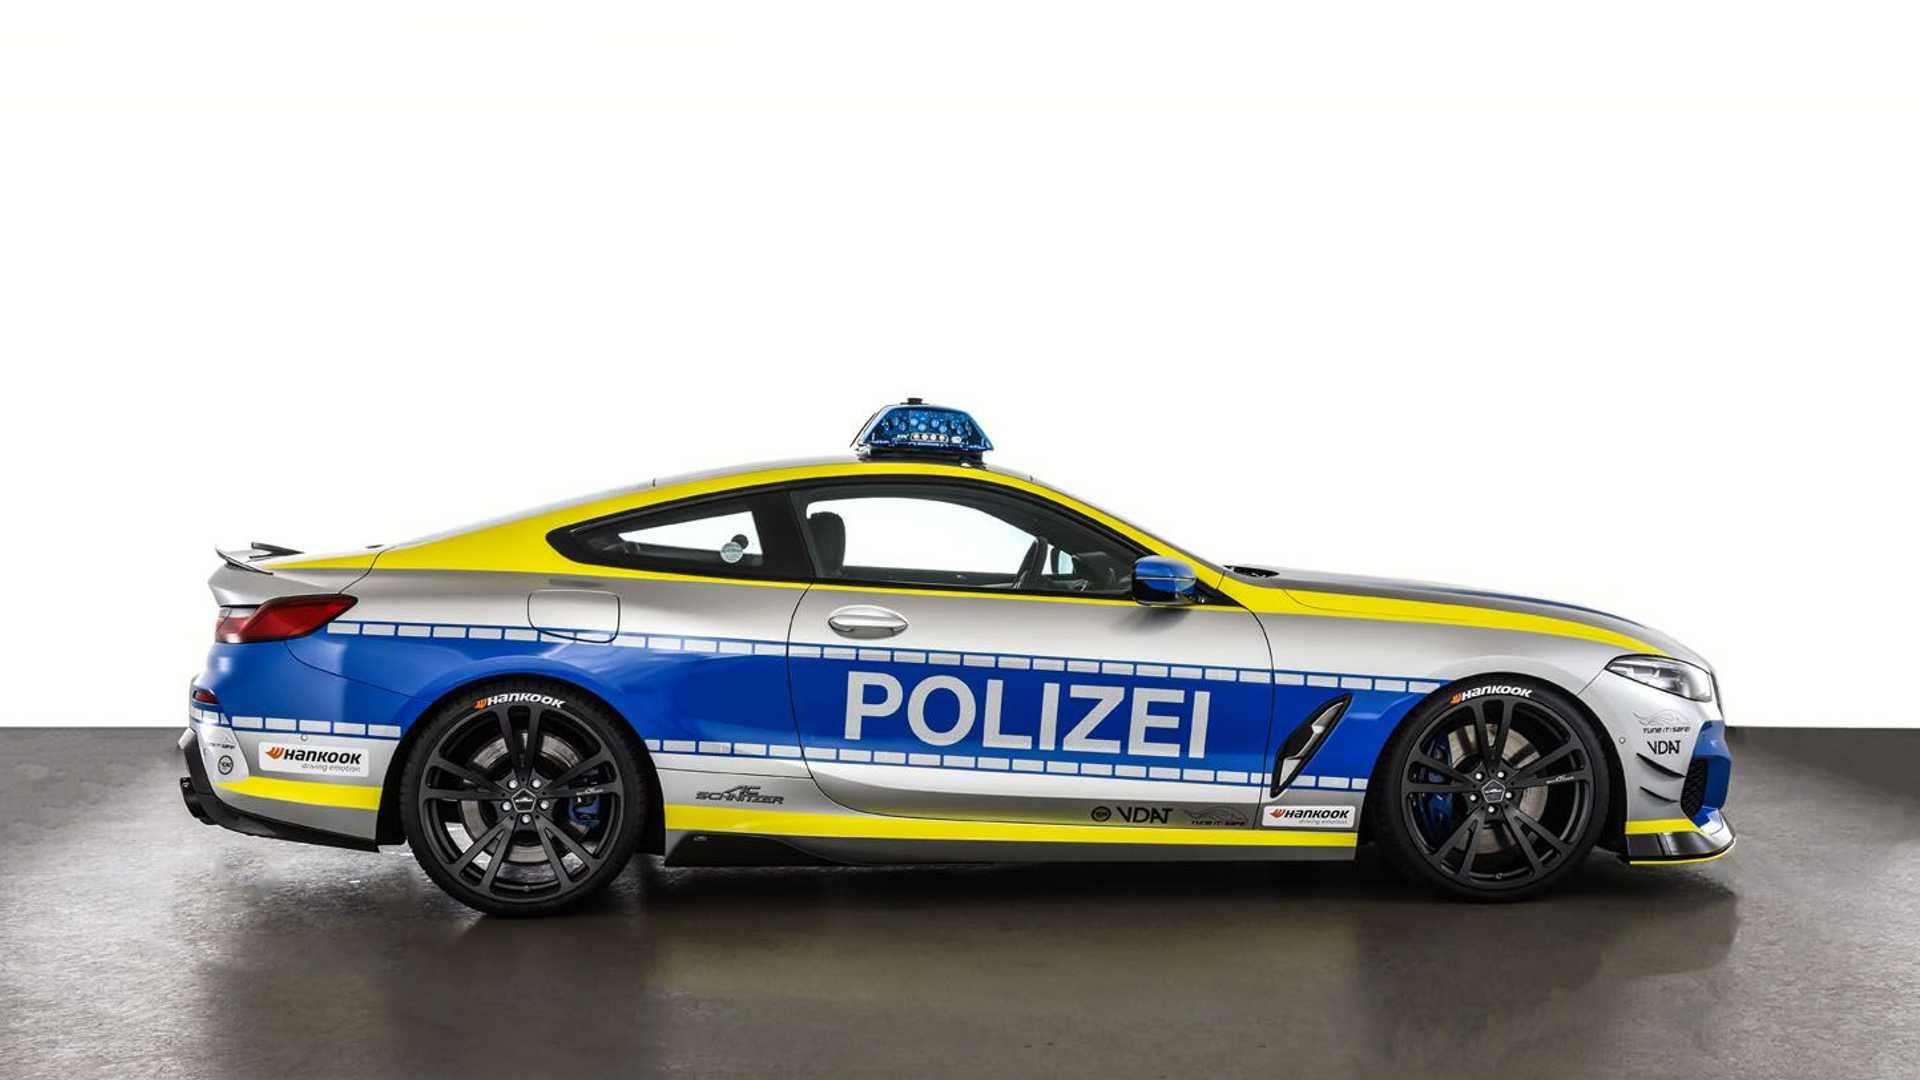 BMW-M850i-police-car-tune-it-safe-24